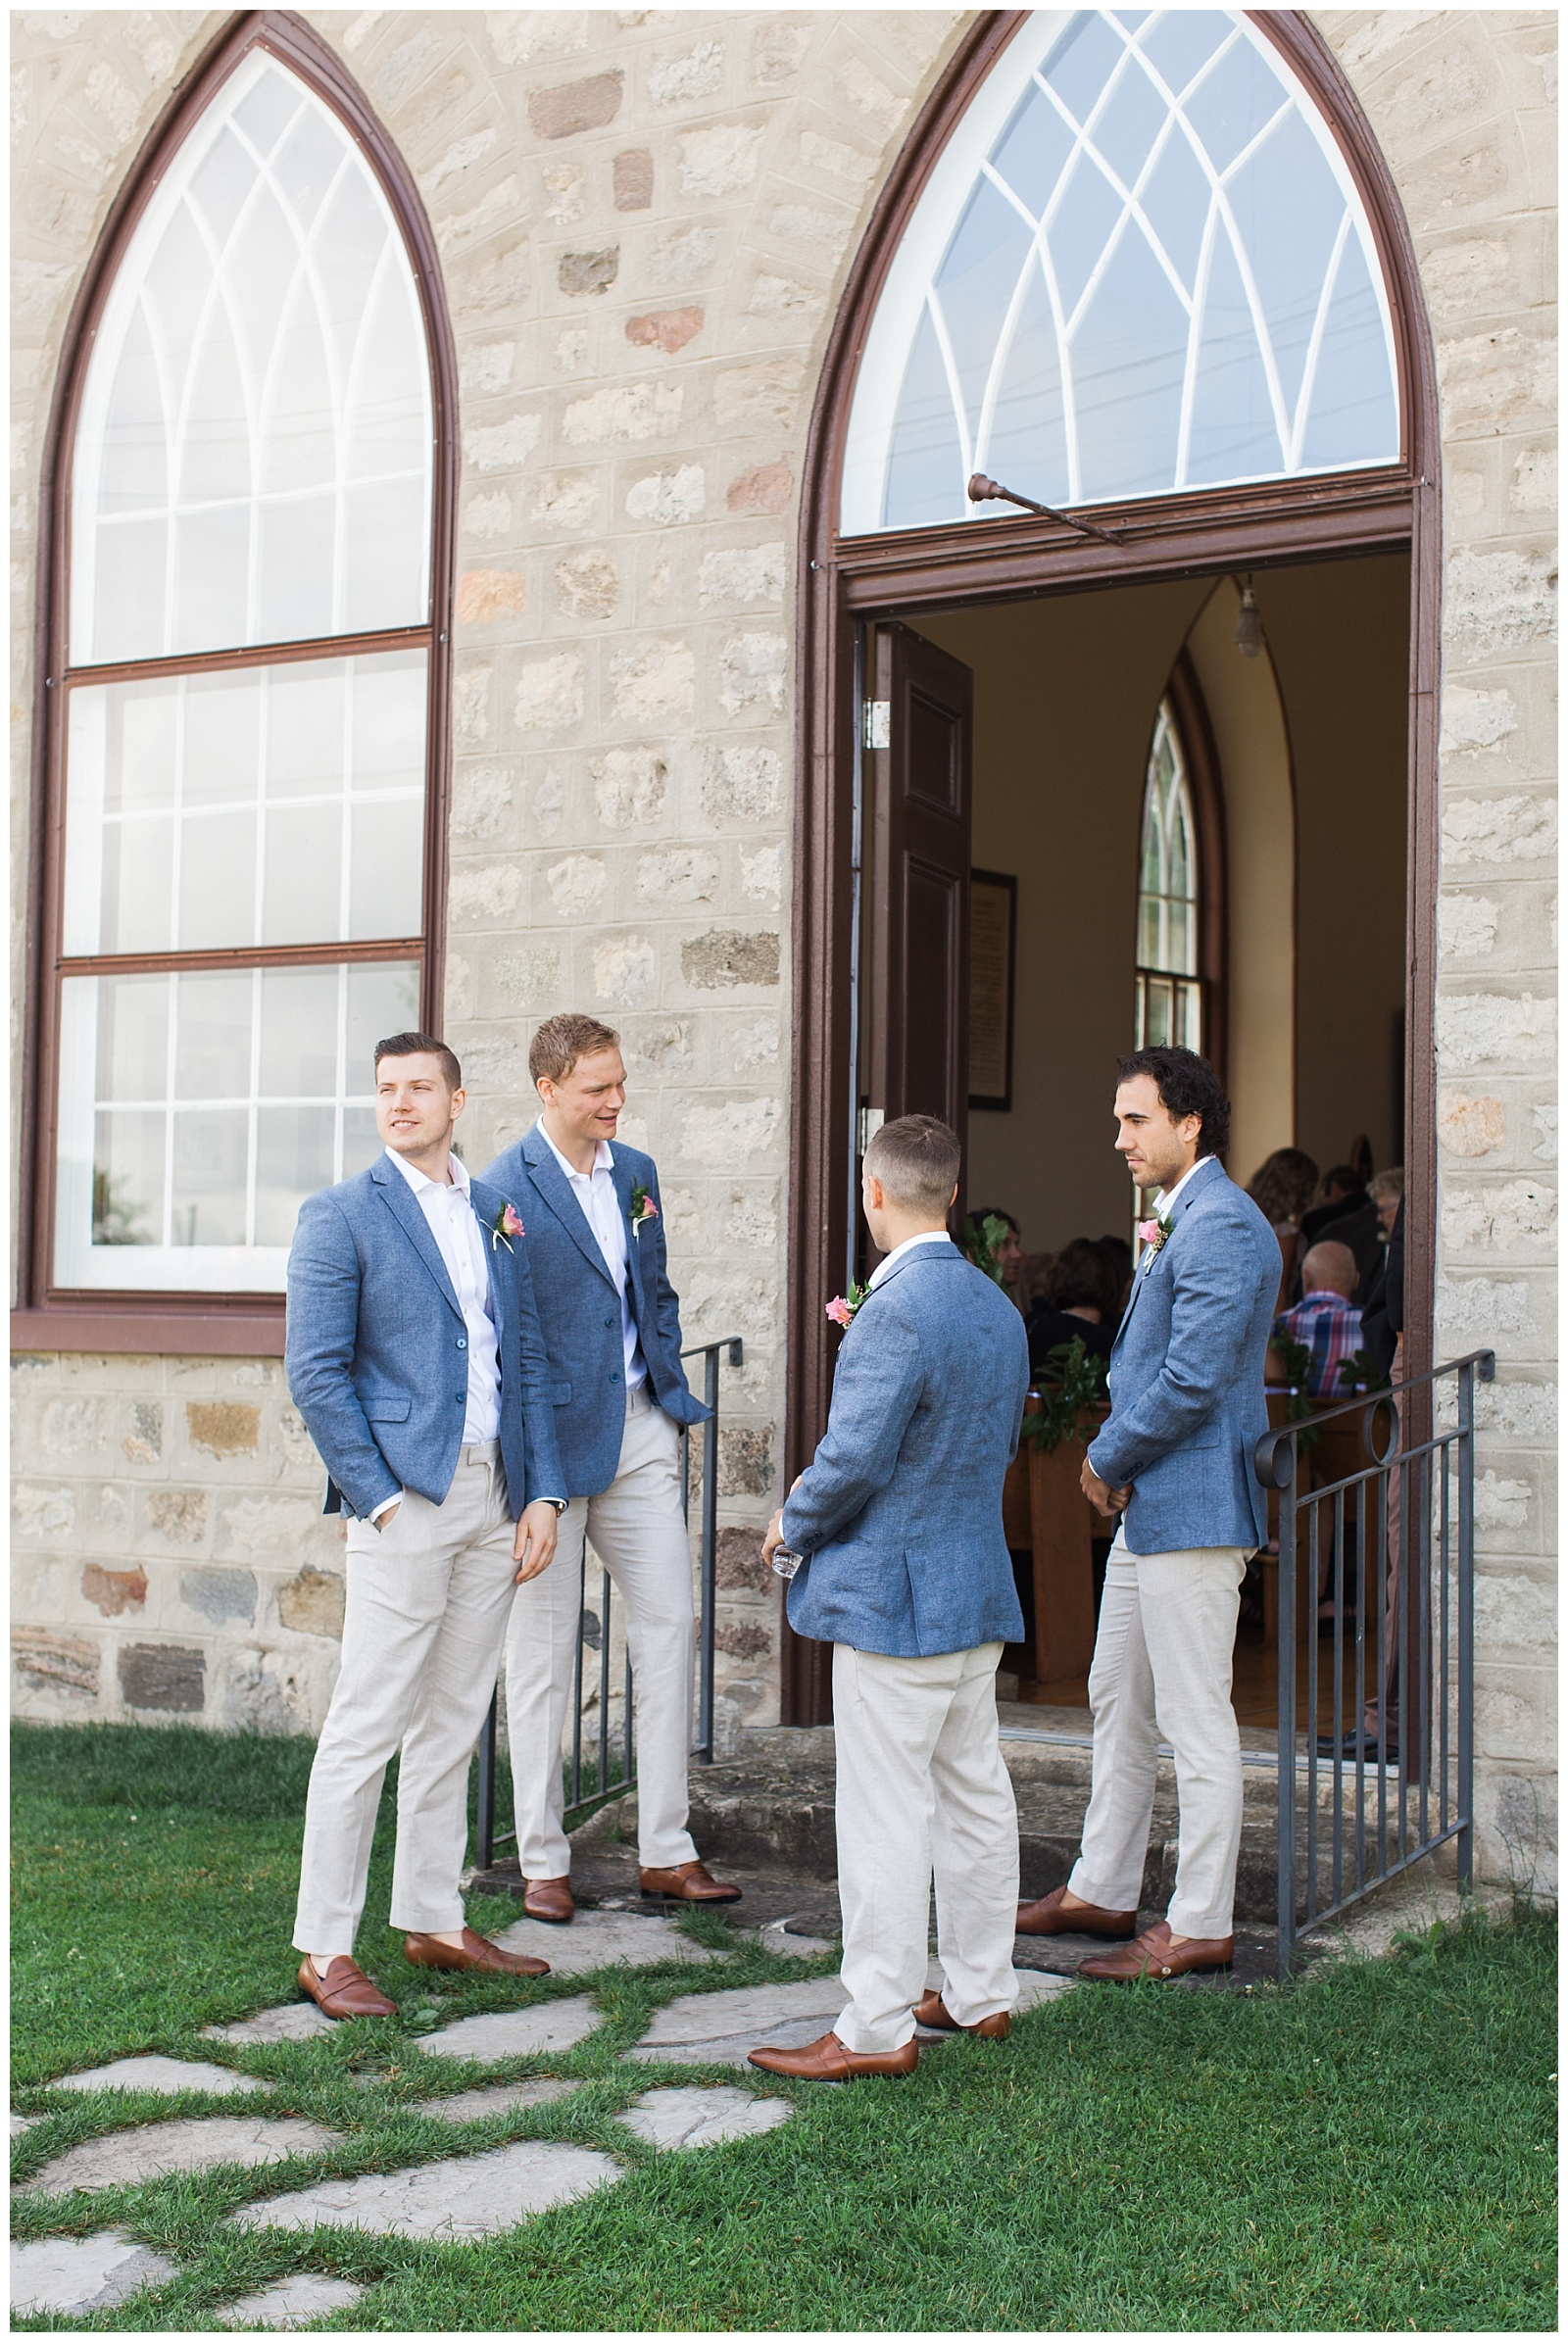 Groomsmen lining the door to the church at Guelph Ontario Wedding | Ontario Wedding Photographer | Toronto Wedding Photographer | 3photography